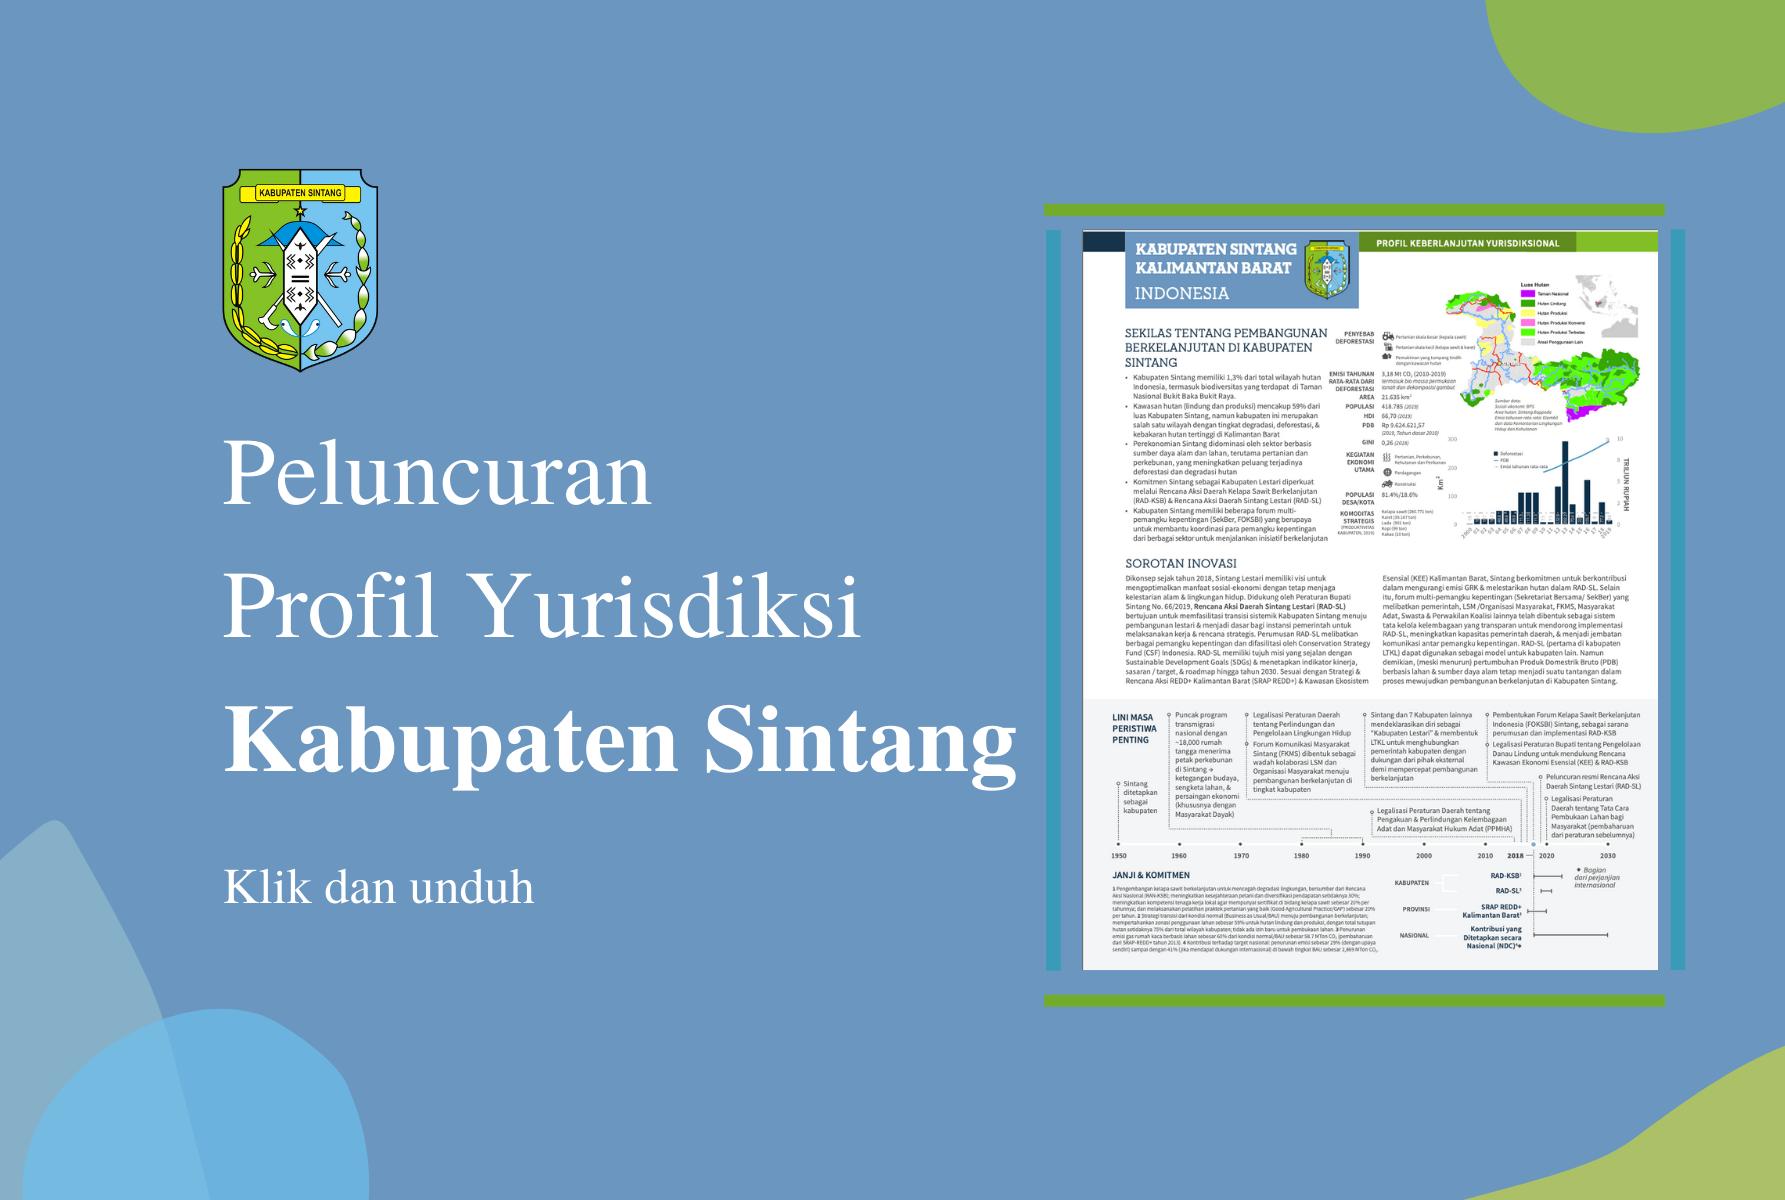 Peluncuran Profil Yurisdiksi Kabupaten Sintang